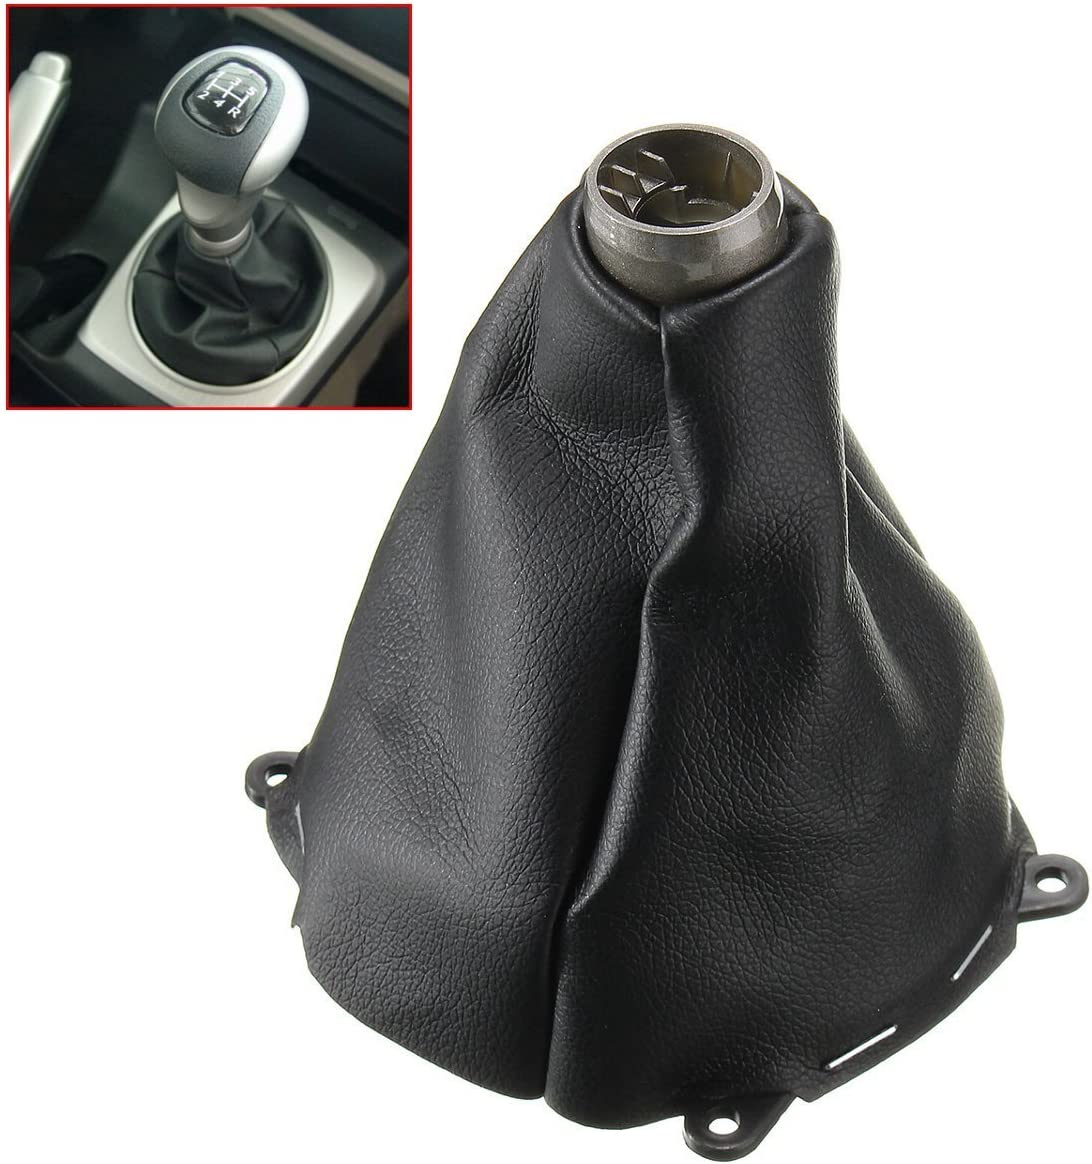 AutoE Car Manual Leather Gear Gaiter Shift Shifter Boot For Honda ...